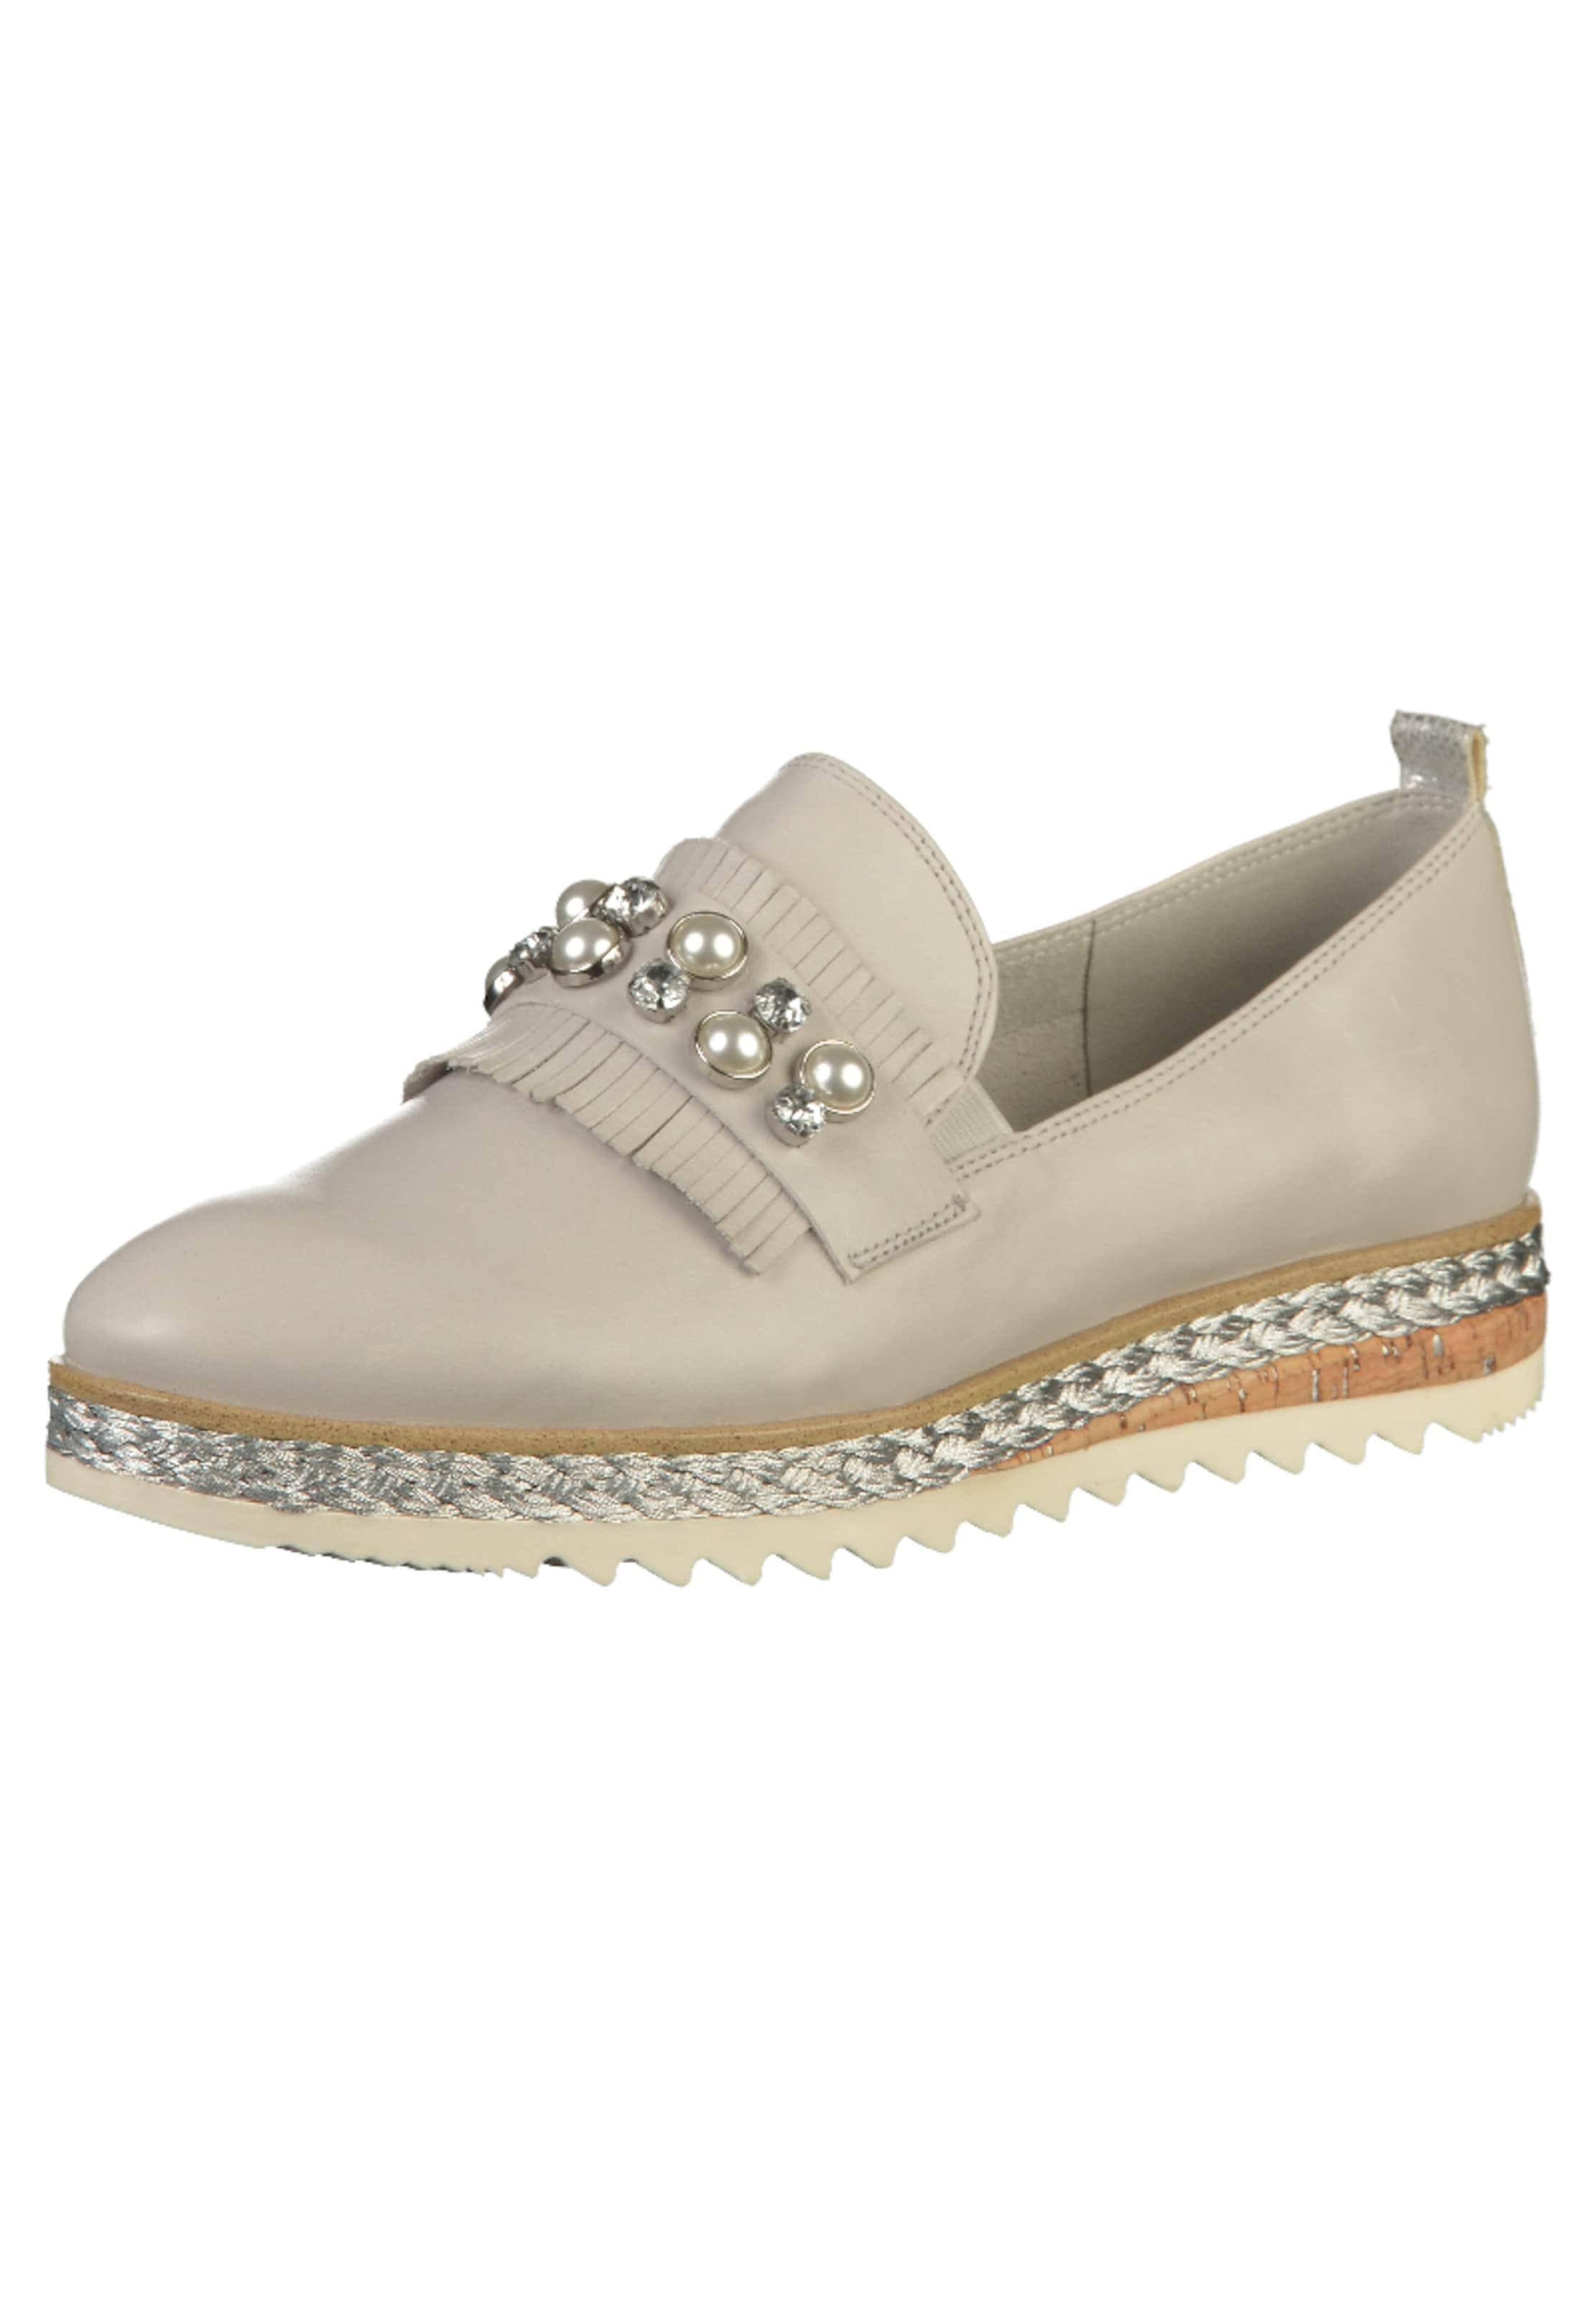 MARCO TOZZI Slipper Verschleißfeste billige Schuhe